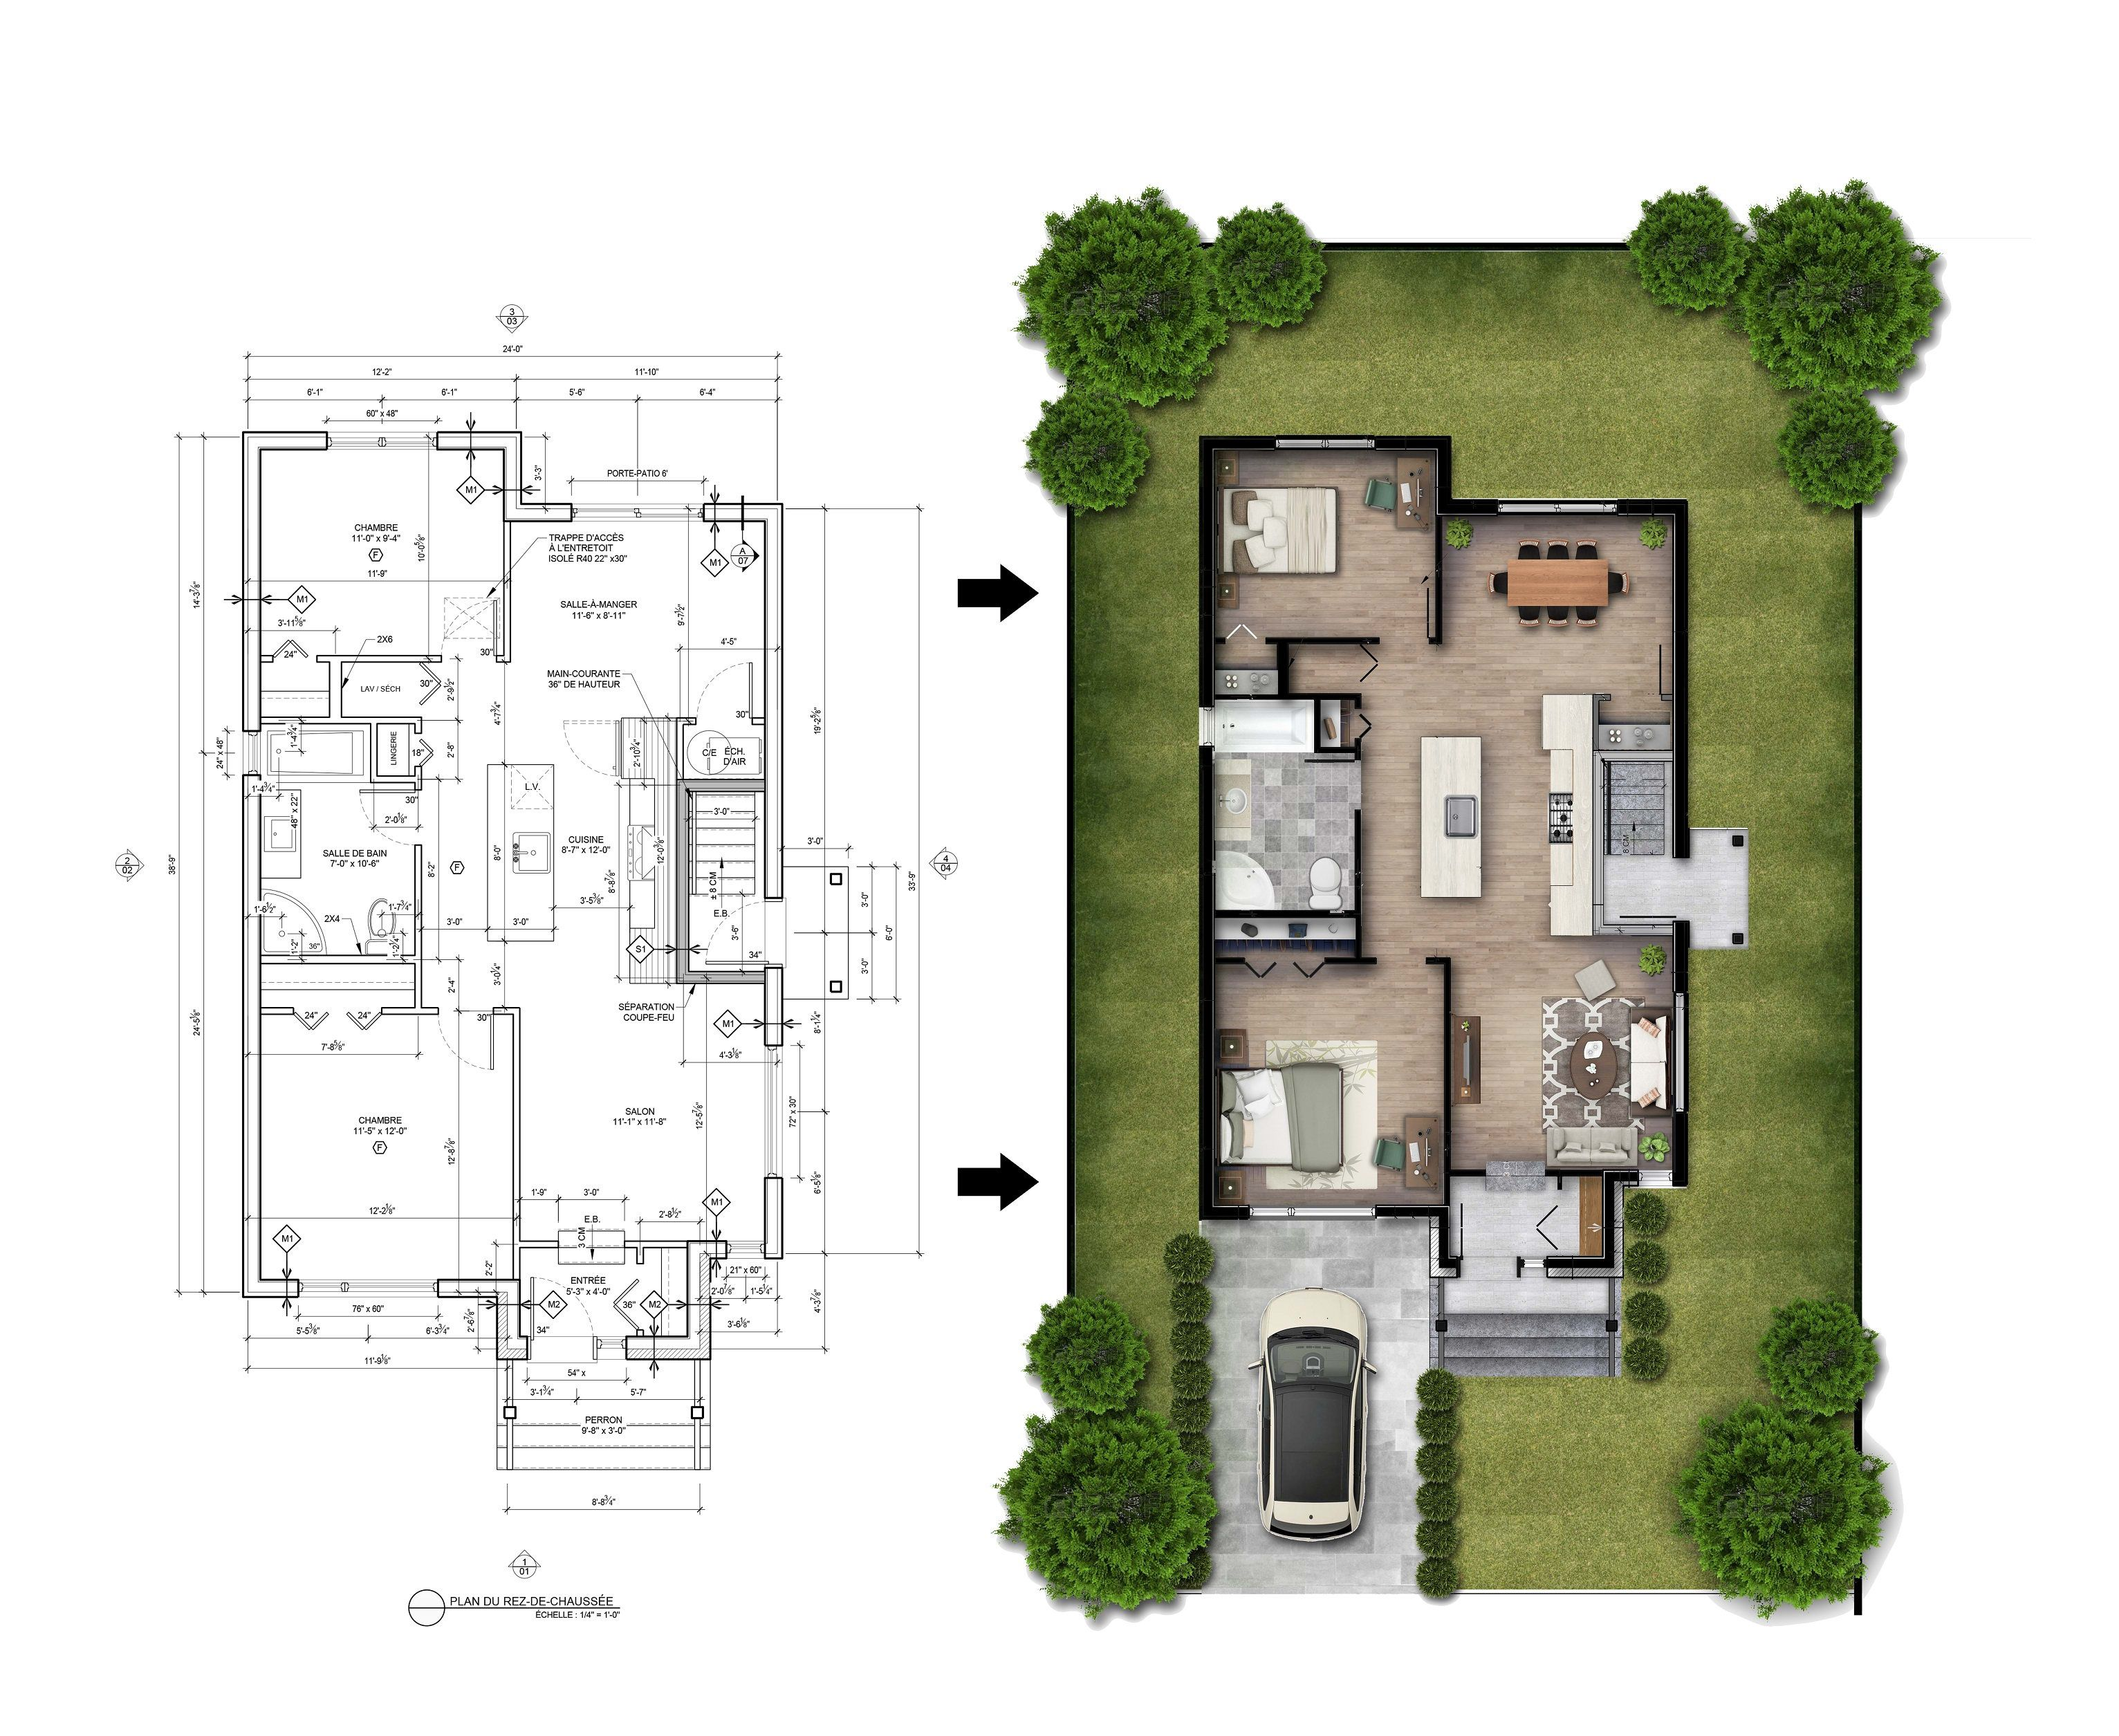 Em Designs I Will Render Your Floor Plans In Photoshop For 20 On Fiverr Com Photoshop Rendering Interior Design Renderings Architectural Floor Plans